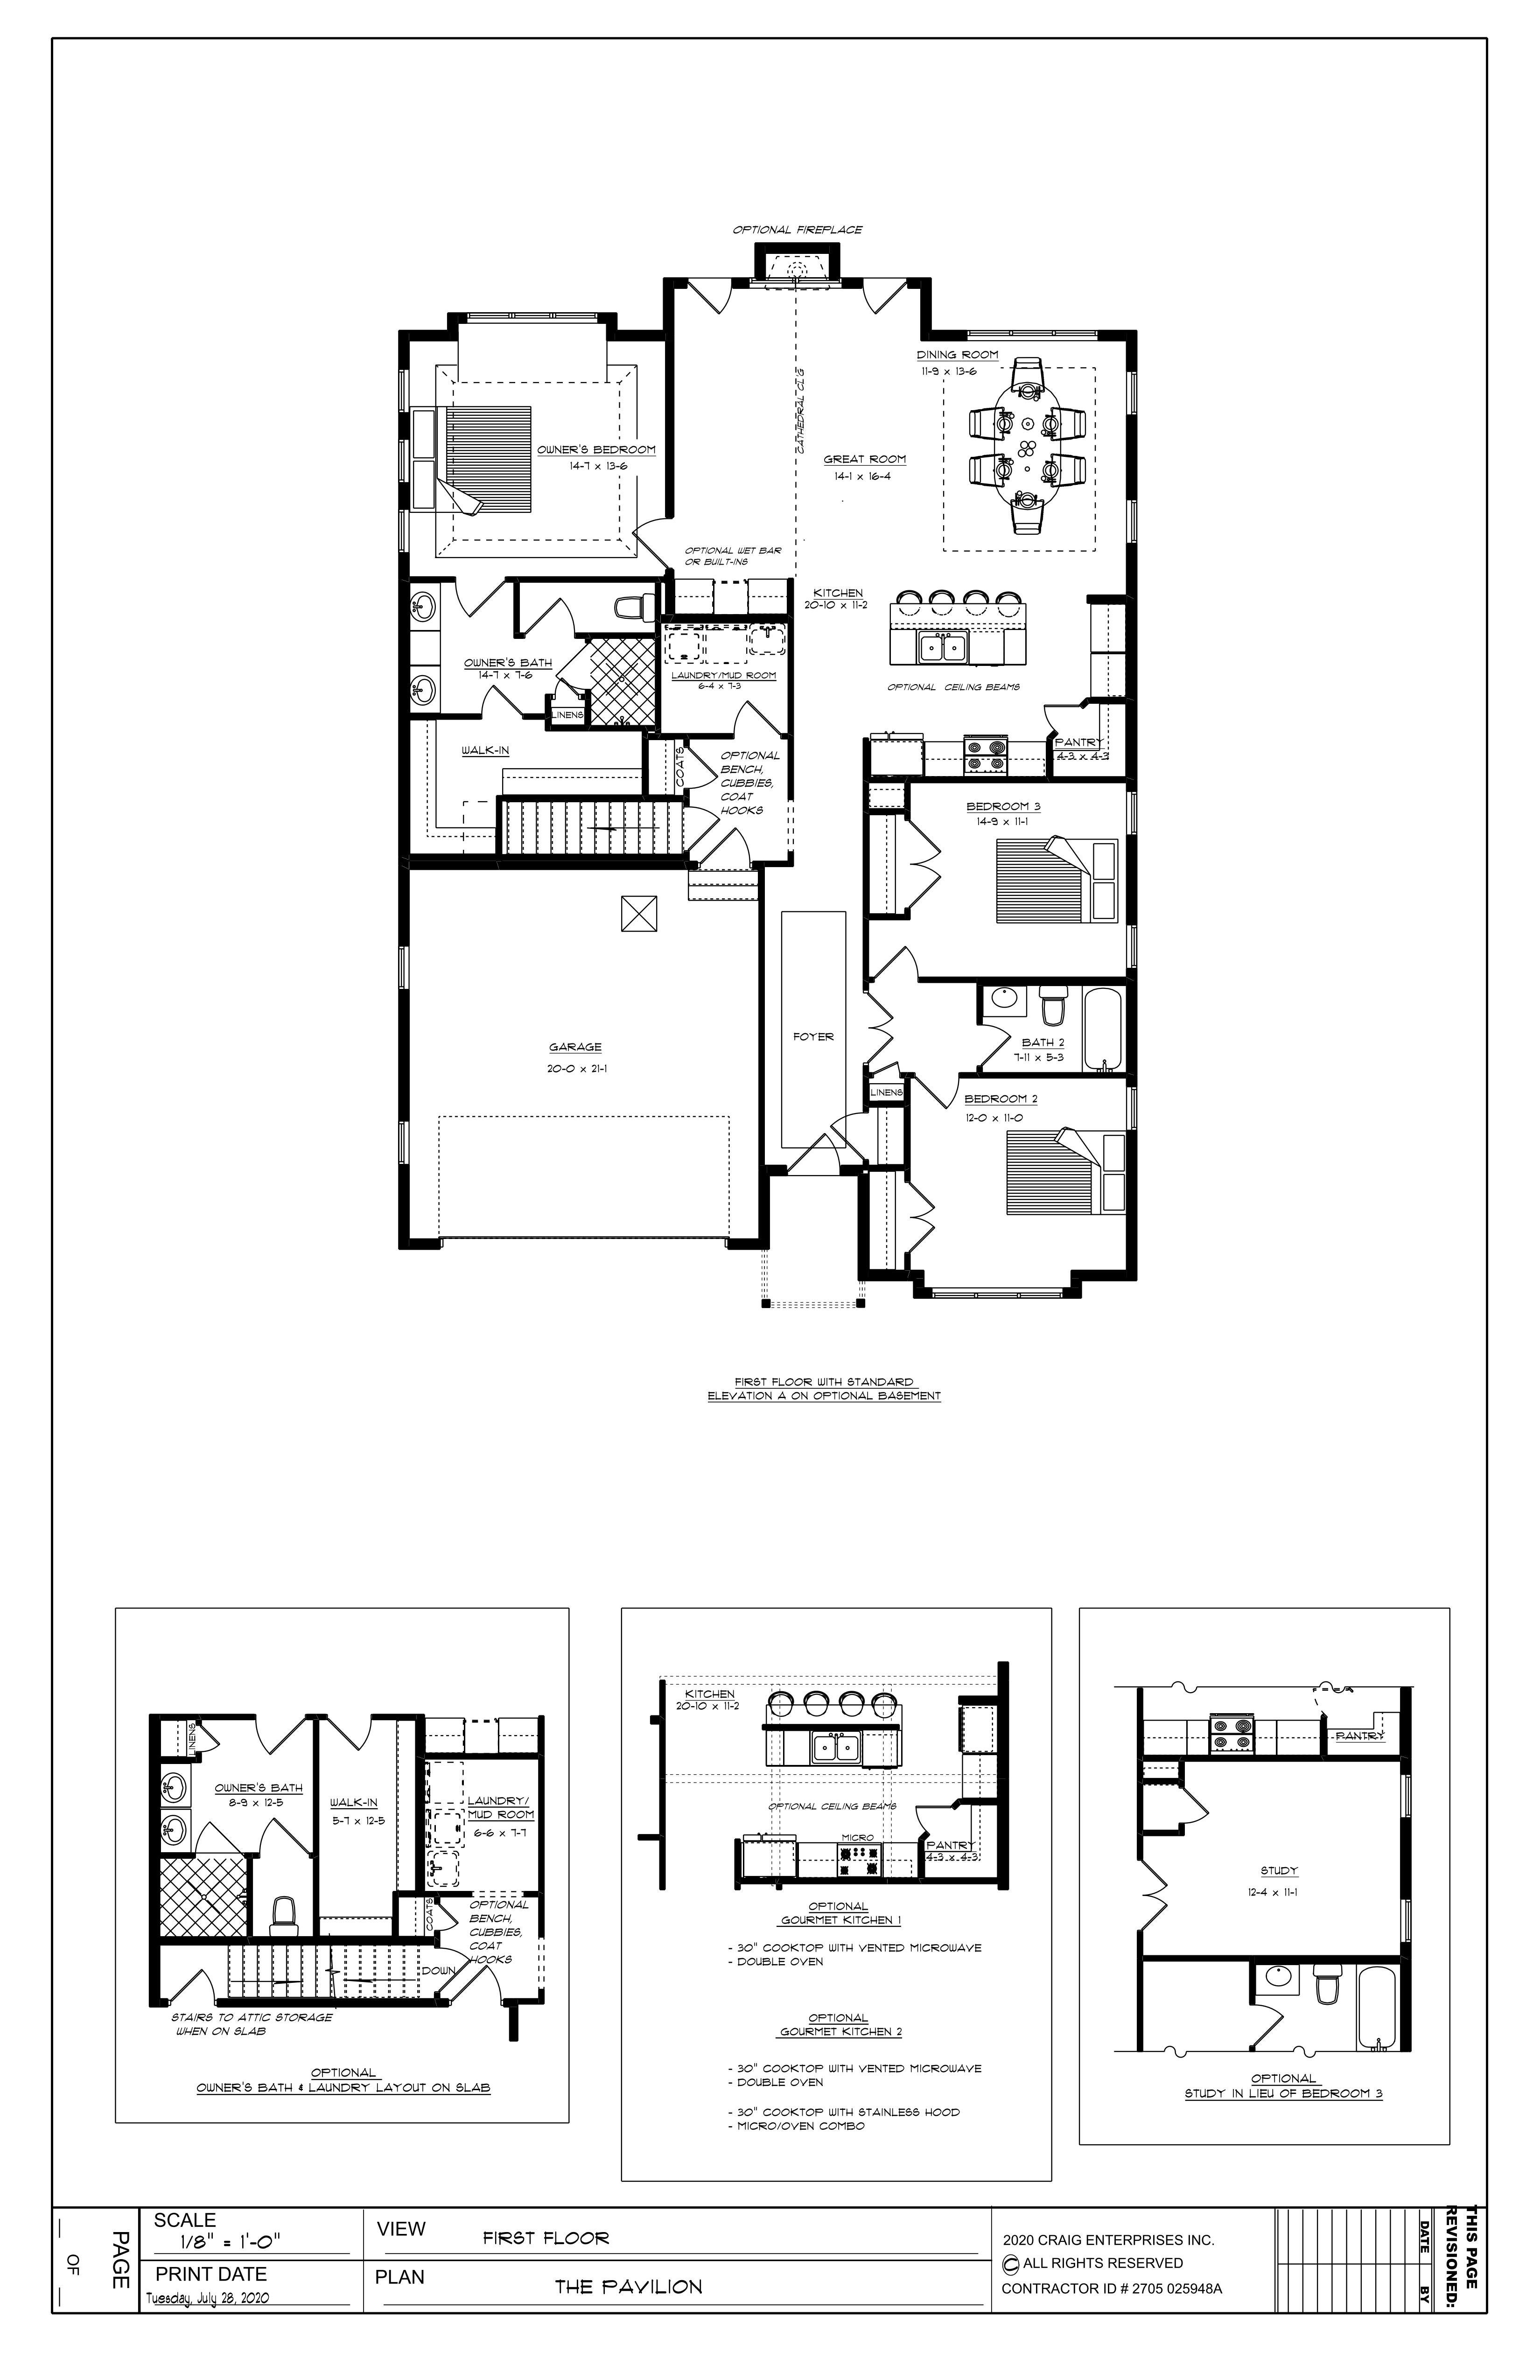 Image 1 - Craig Builders home in Glenmore